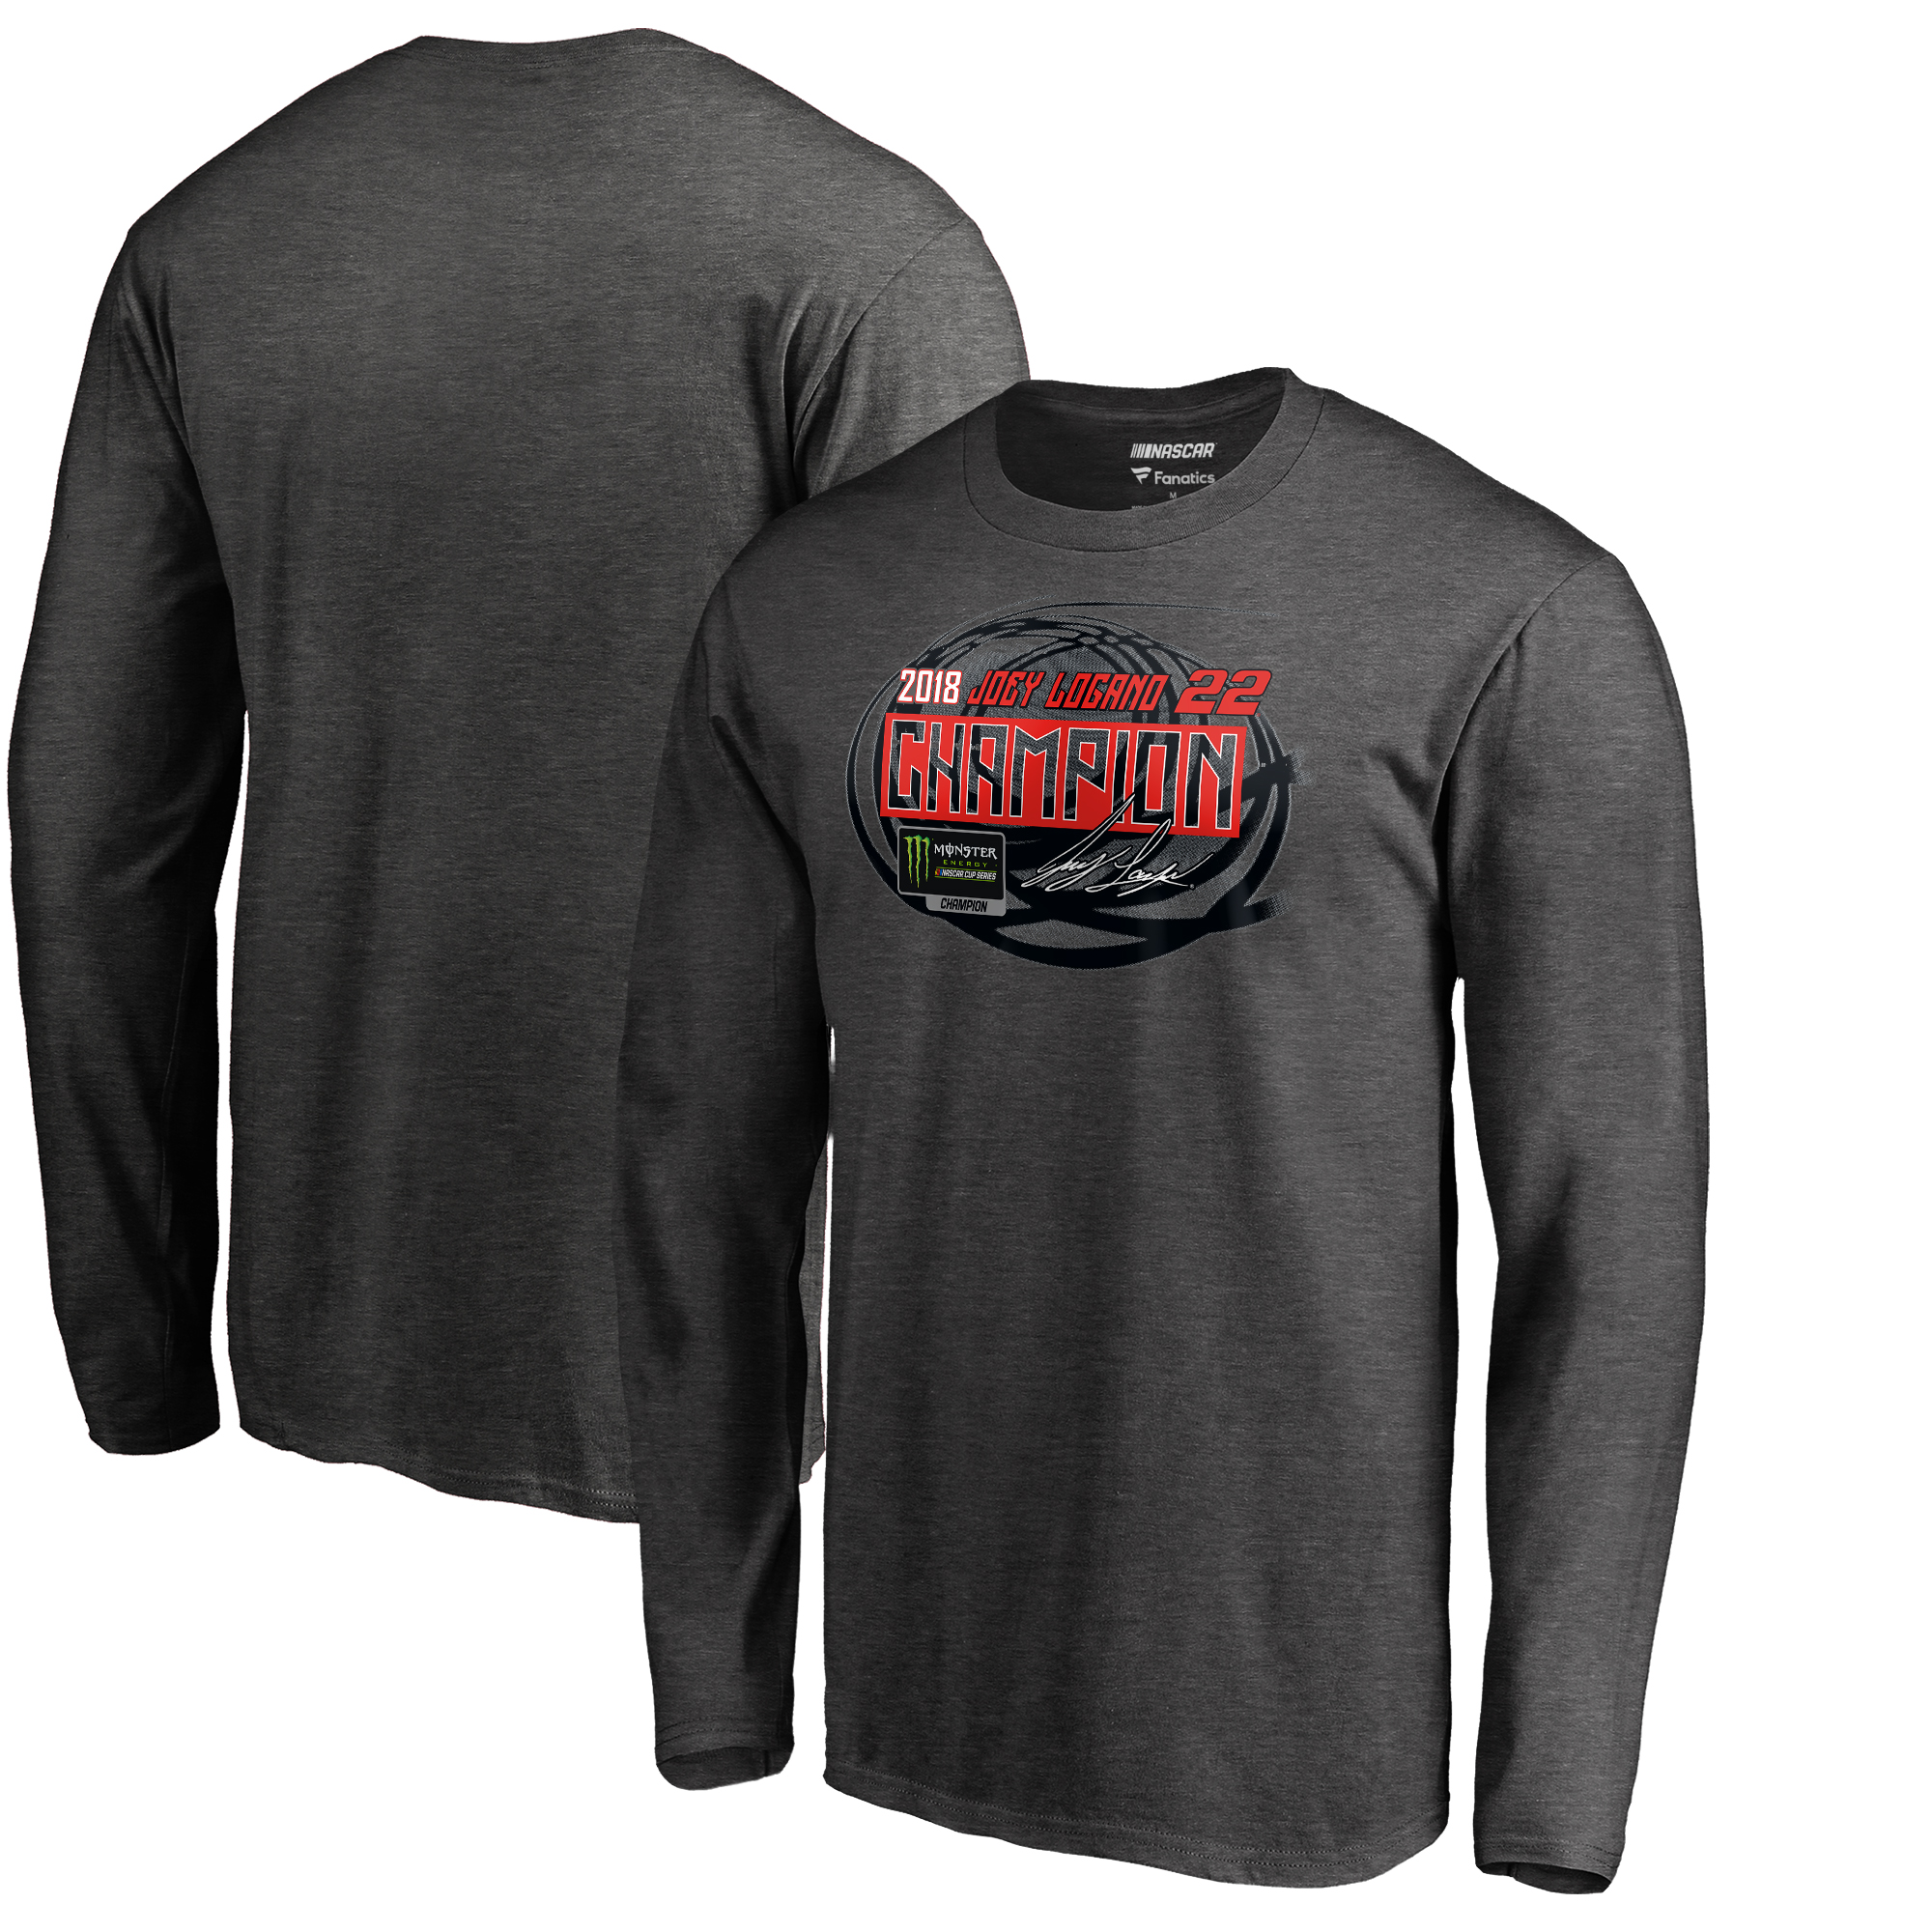 Joey Logano Fanatics Branded 2018 Monster Energy NASCAR Cup Series Champion Winner's Circle Long Sleeve T-Shirt - Heather Gray